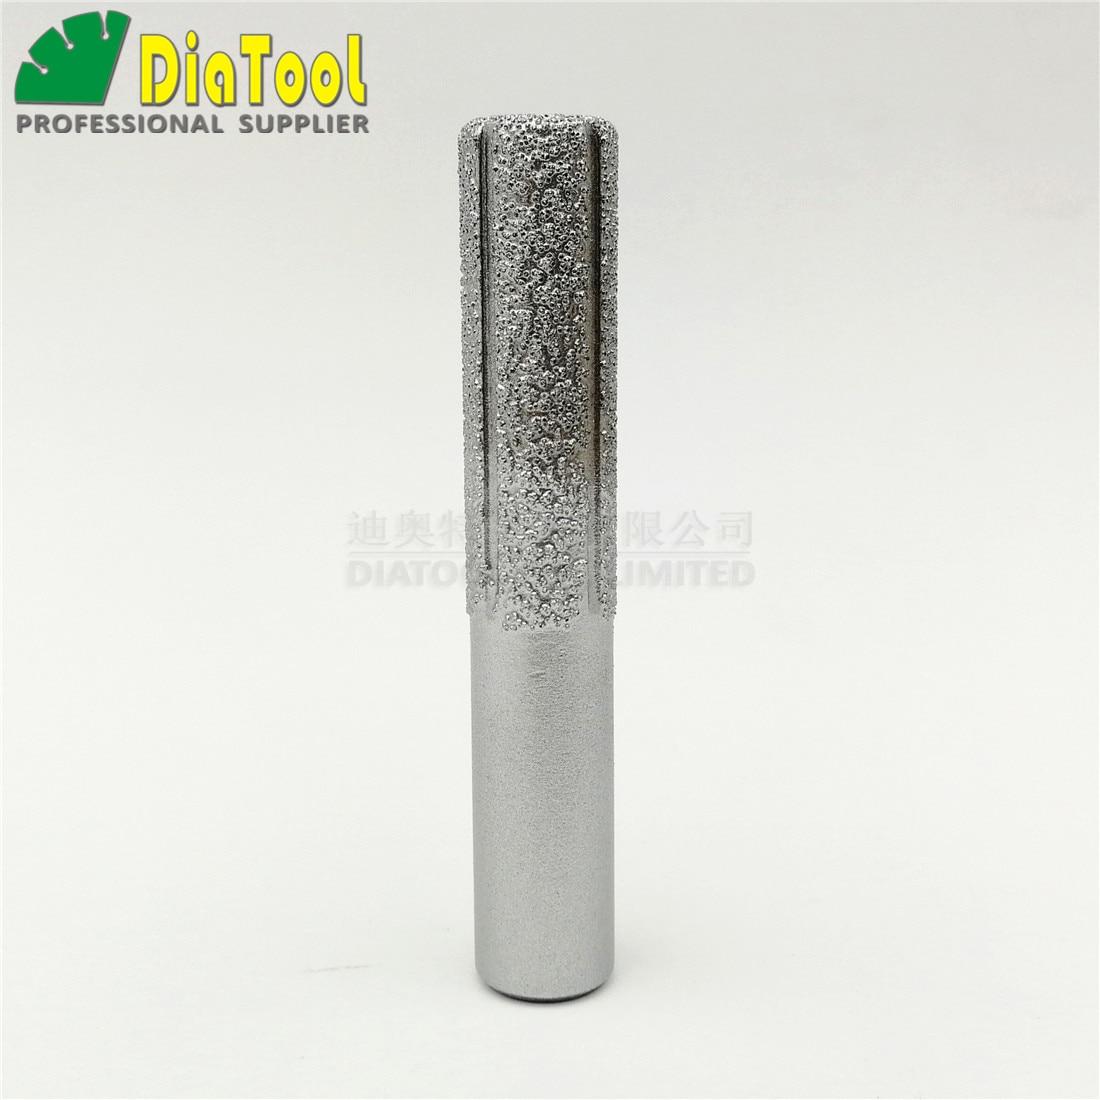 1pc Straight Diamond Vacuum Brazing Brazed Router Finger Bit Grinding For Marble Granite Knife Brazed Diamond Router Bits Cutter Making Things Convenient For Customers Tools